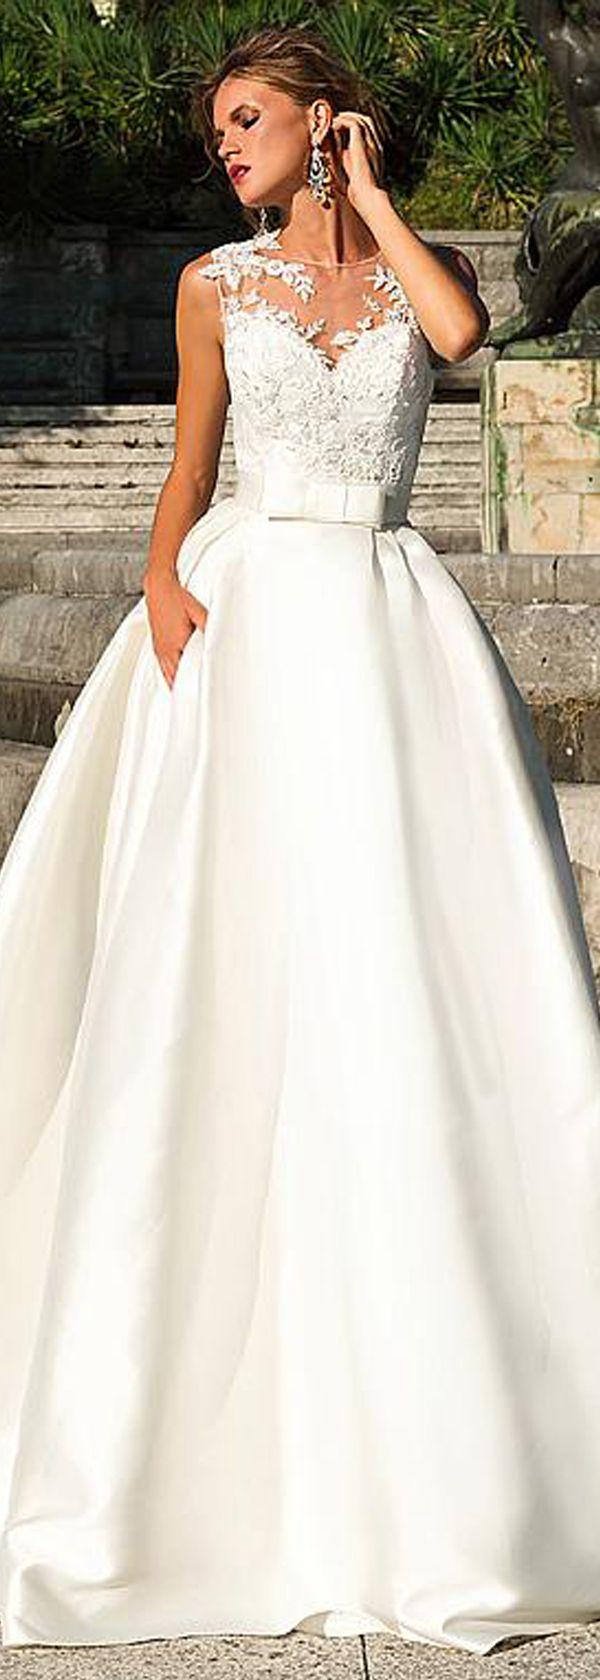 Marvelous tulle u satin jewel neckline aline wedding dress with